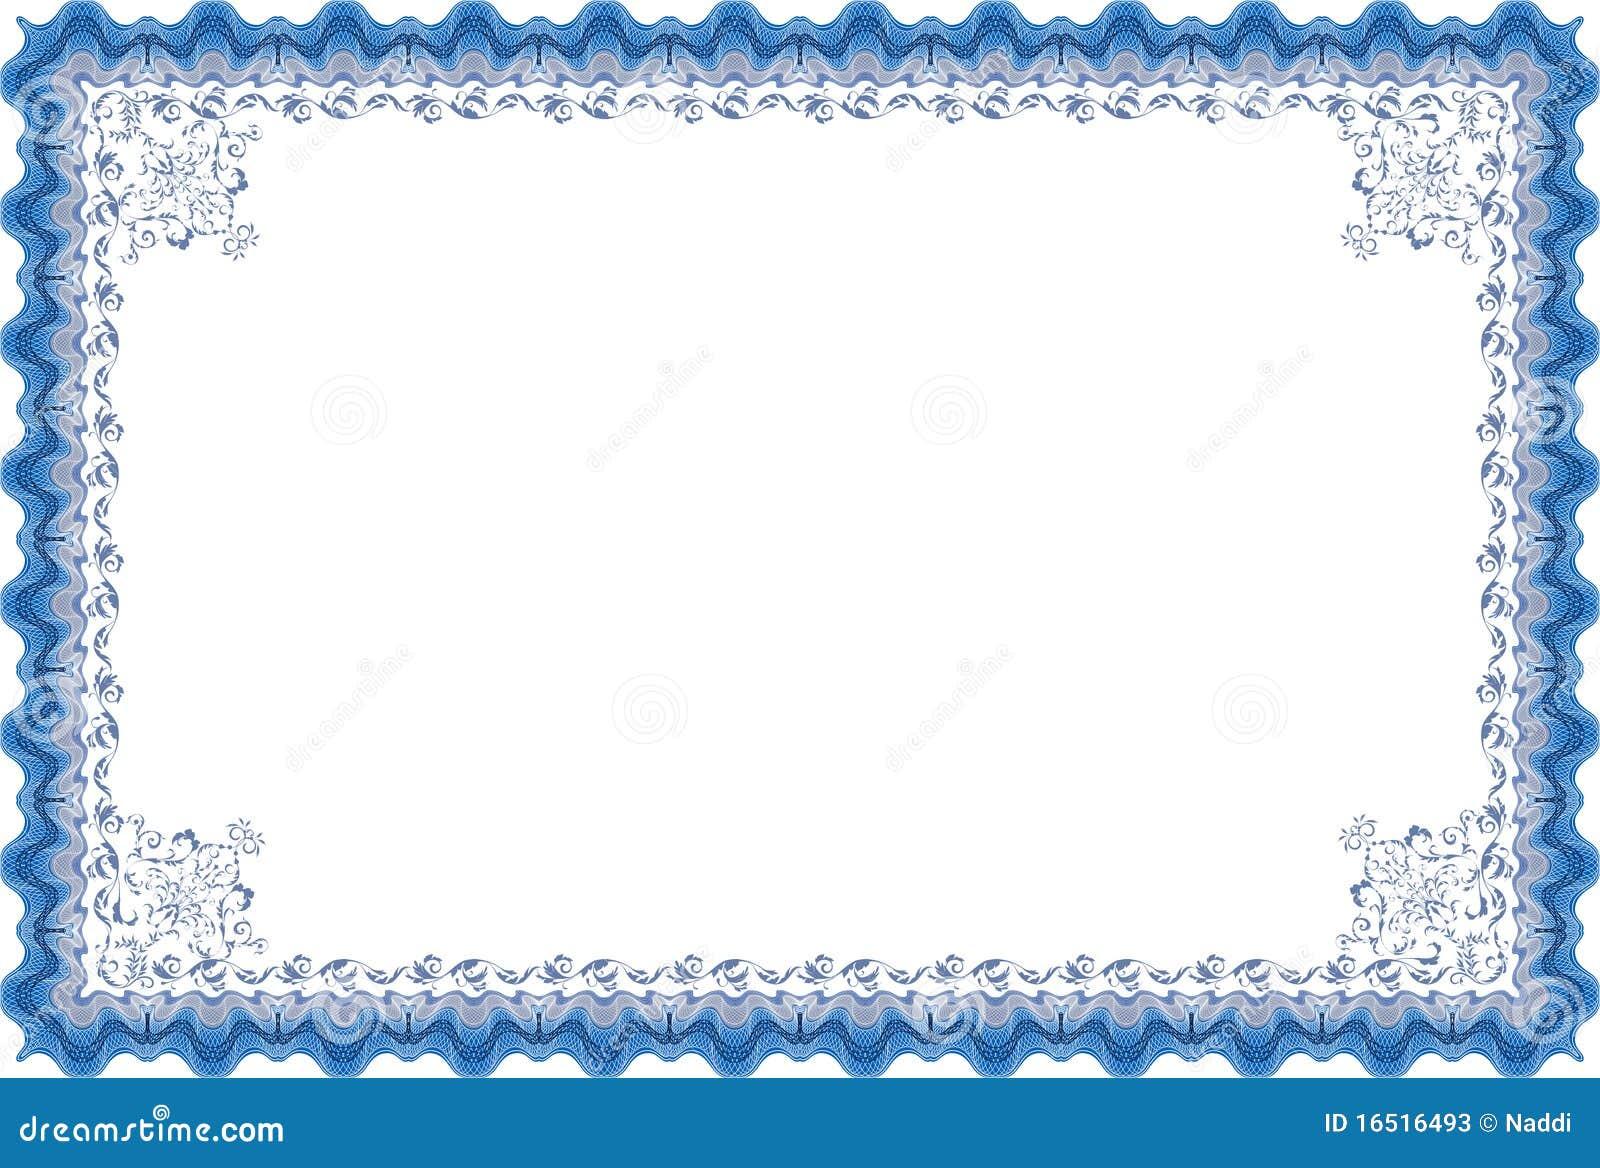 Border Diploma Or Certificate Stock Photos Image 16516493